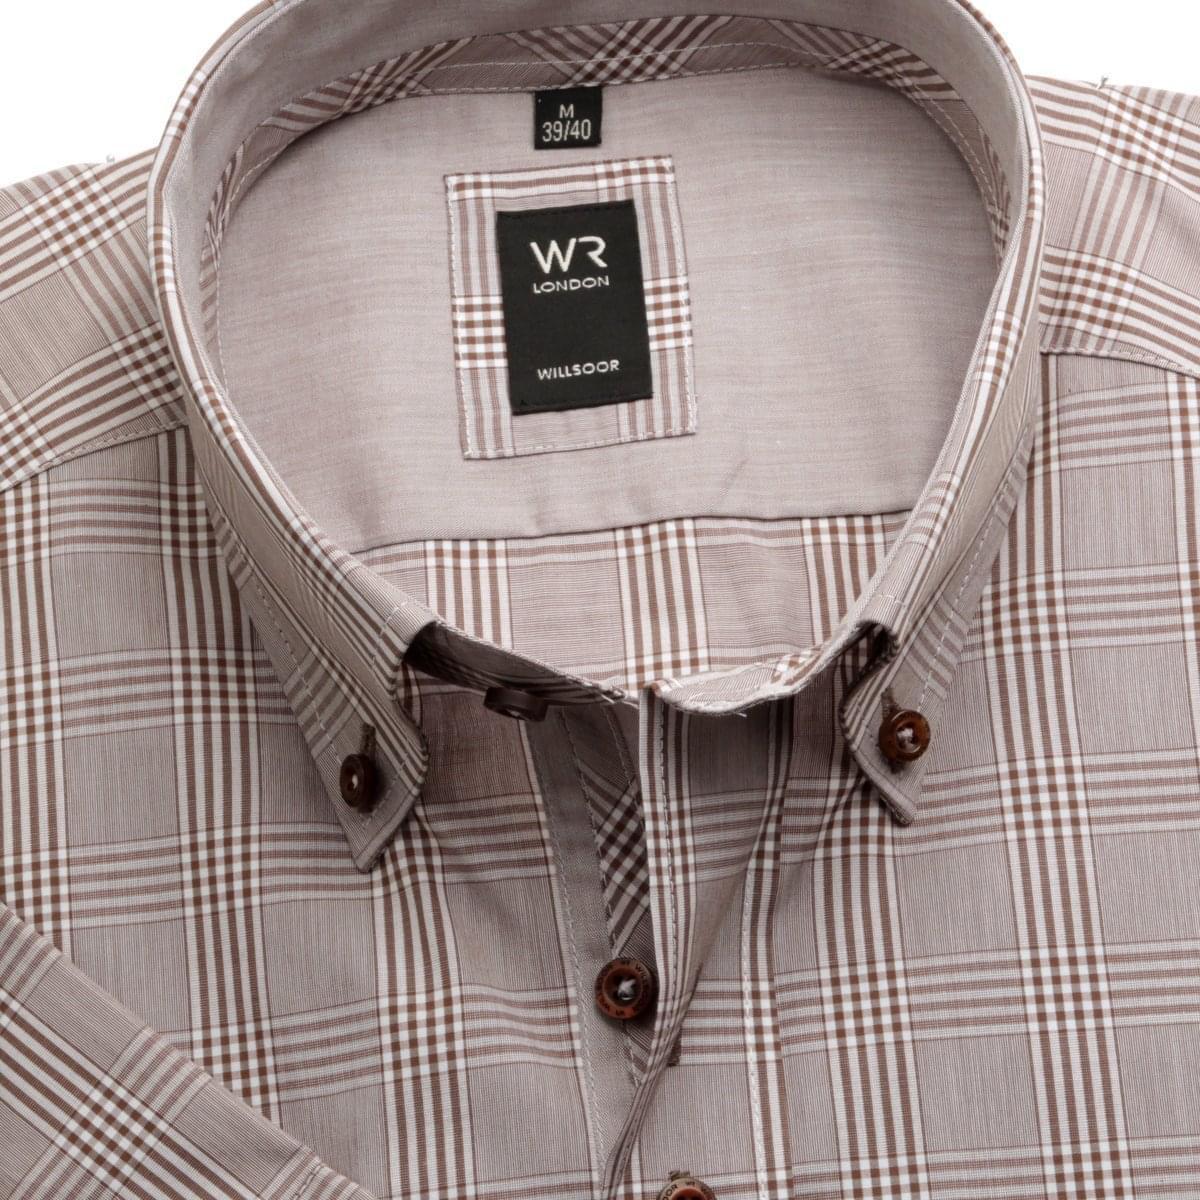 Willsoor Košile WR Slim Fit (výška 176-182) 3629 176-182 / XL (43/44)